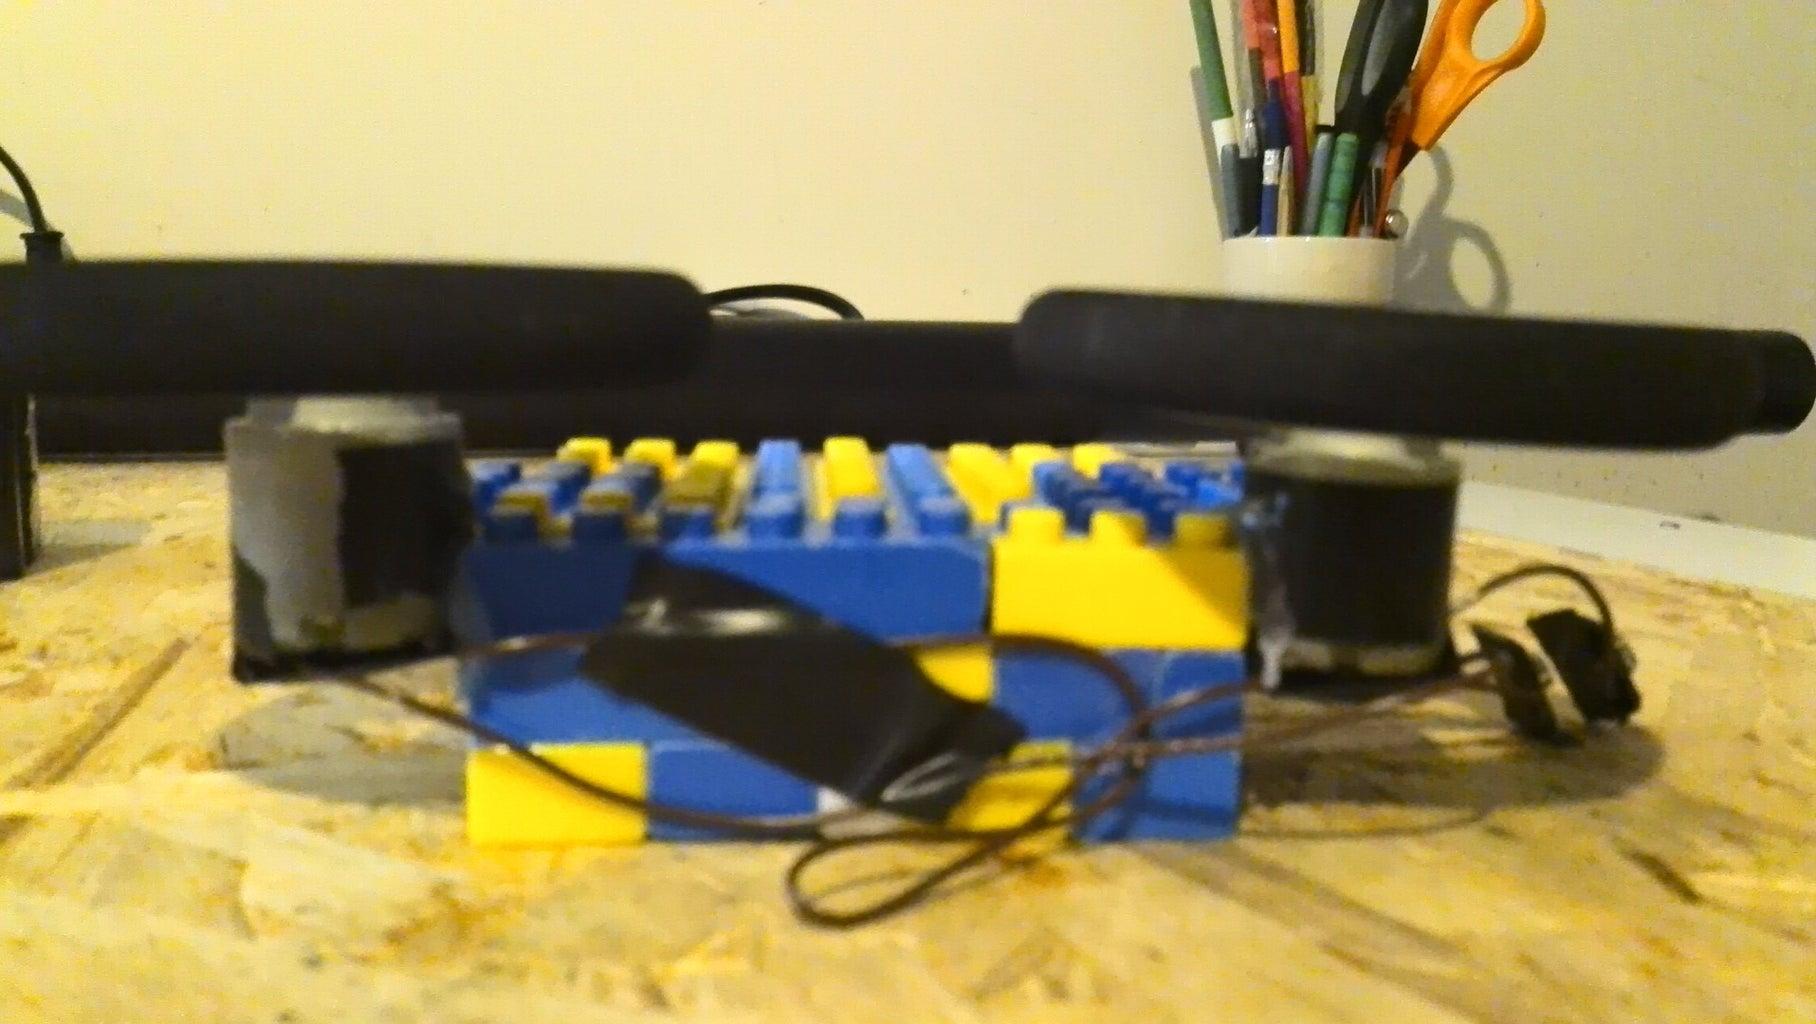 Build the Ping Pong Ball Shooter